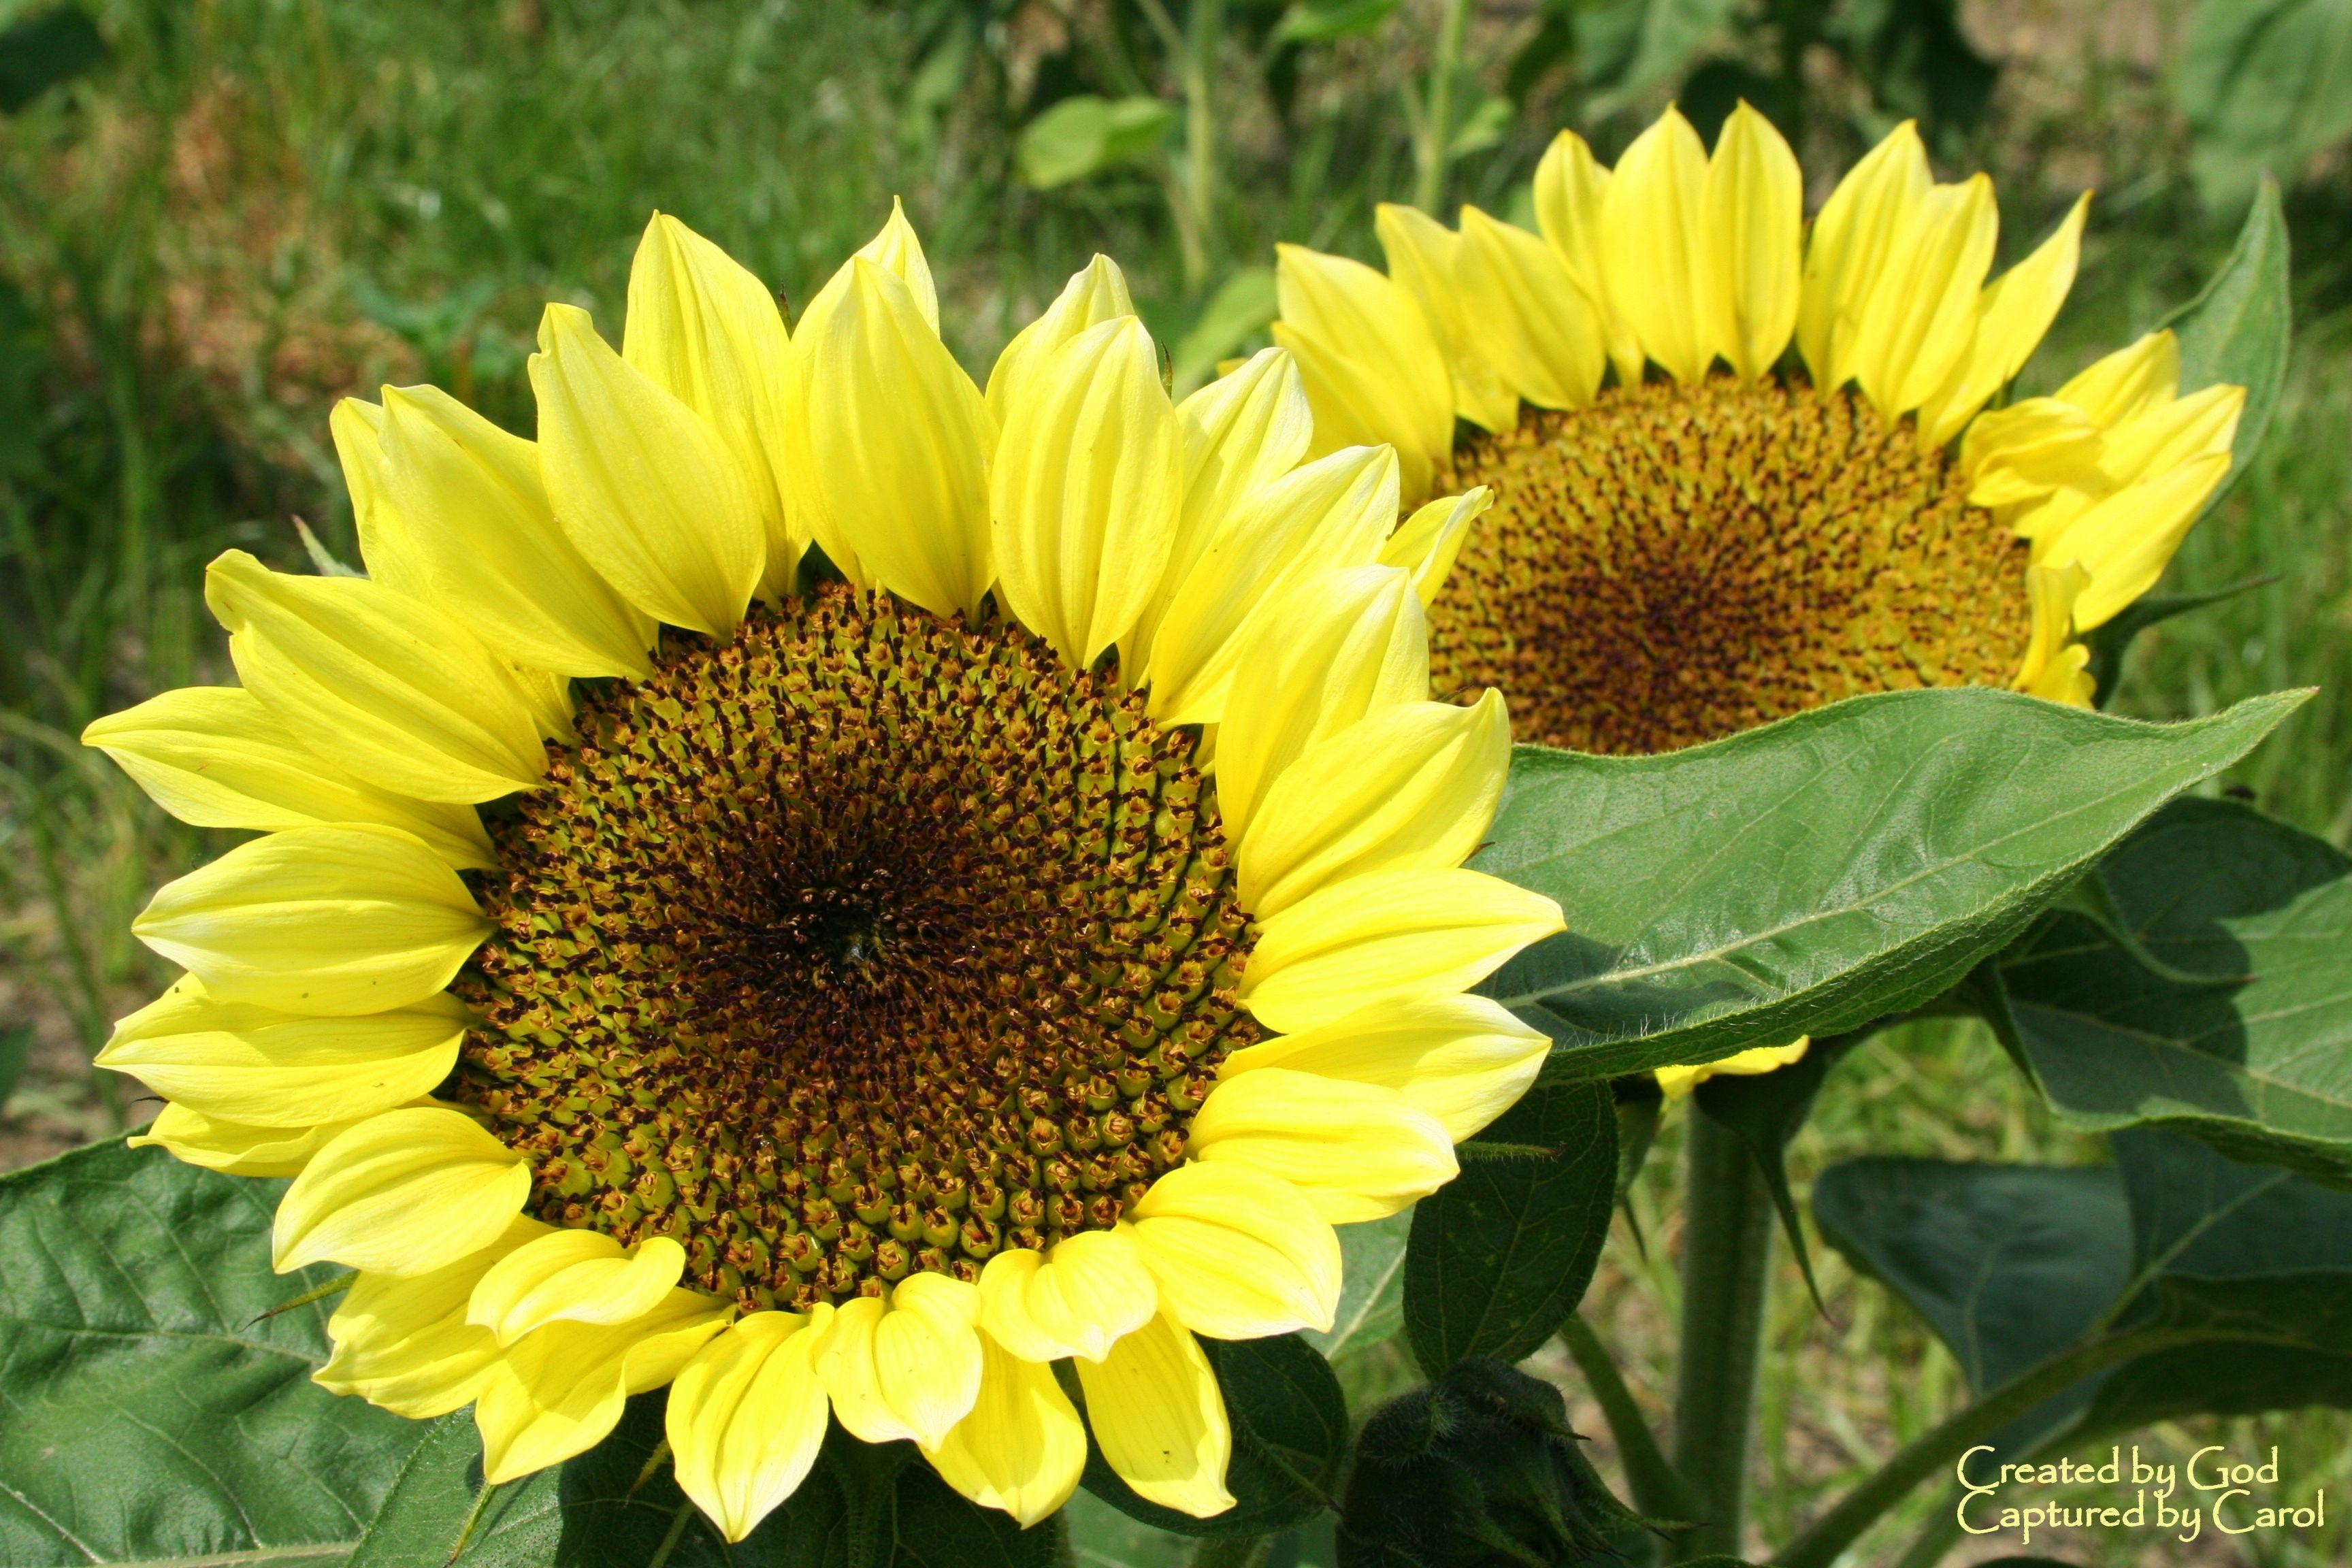 Sunflowers 해바라기 해바라기 그림